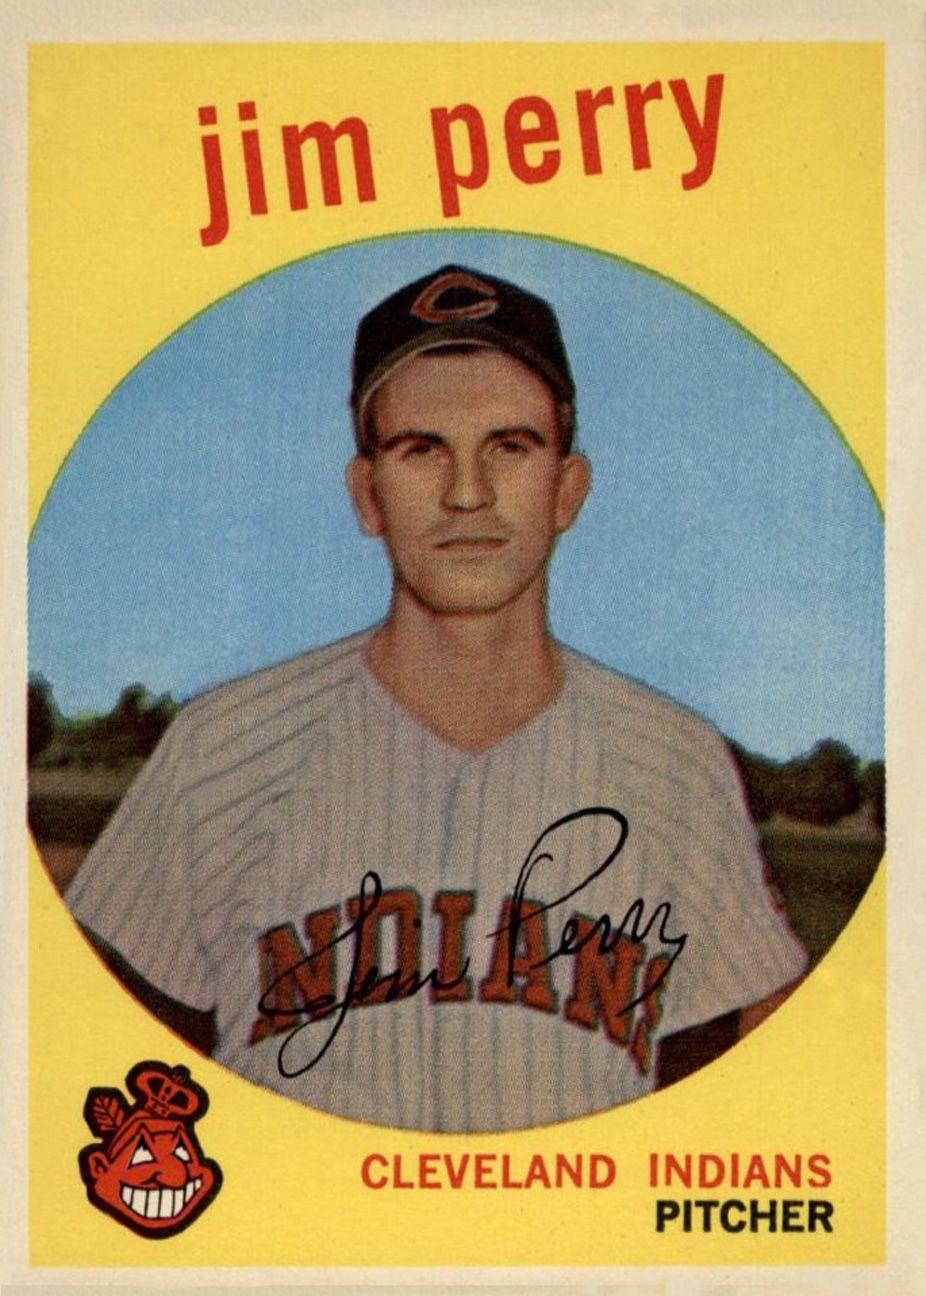 1959 topps jim perry baseball card values baseball